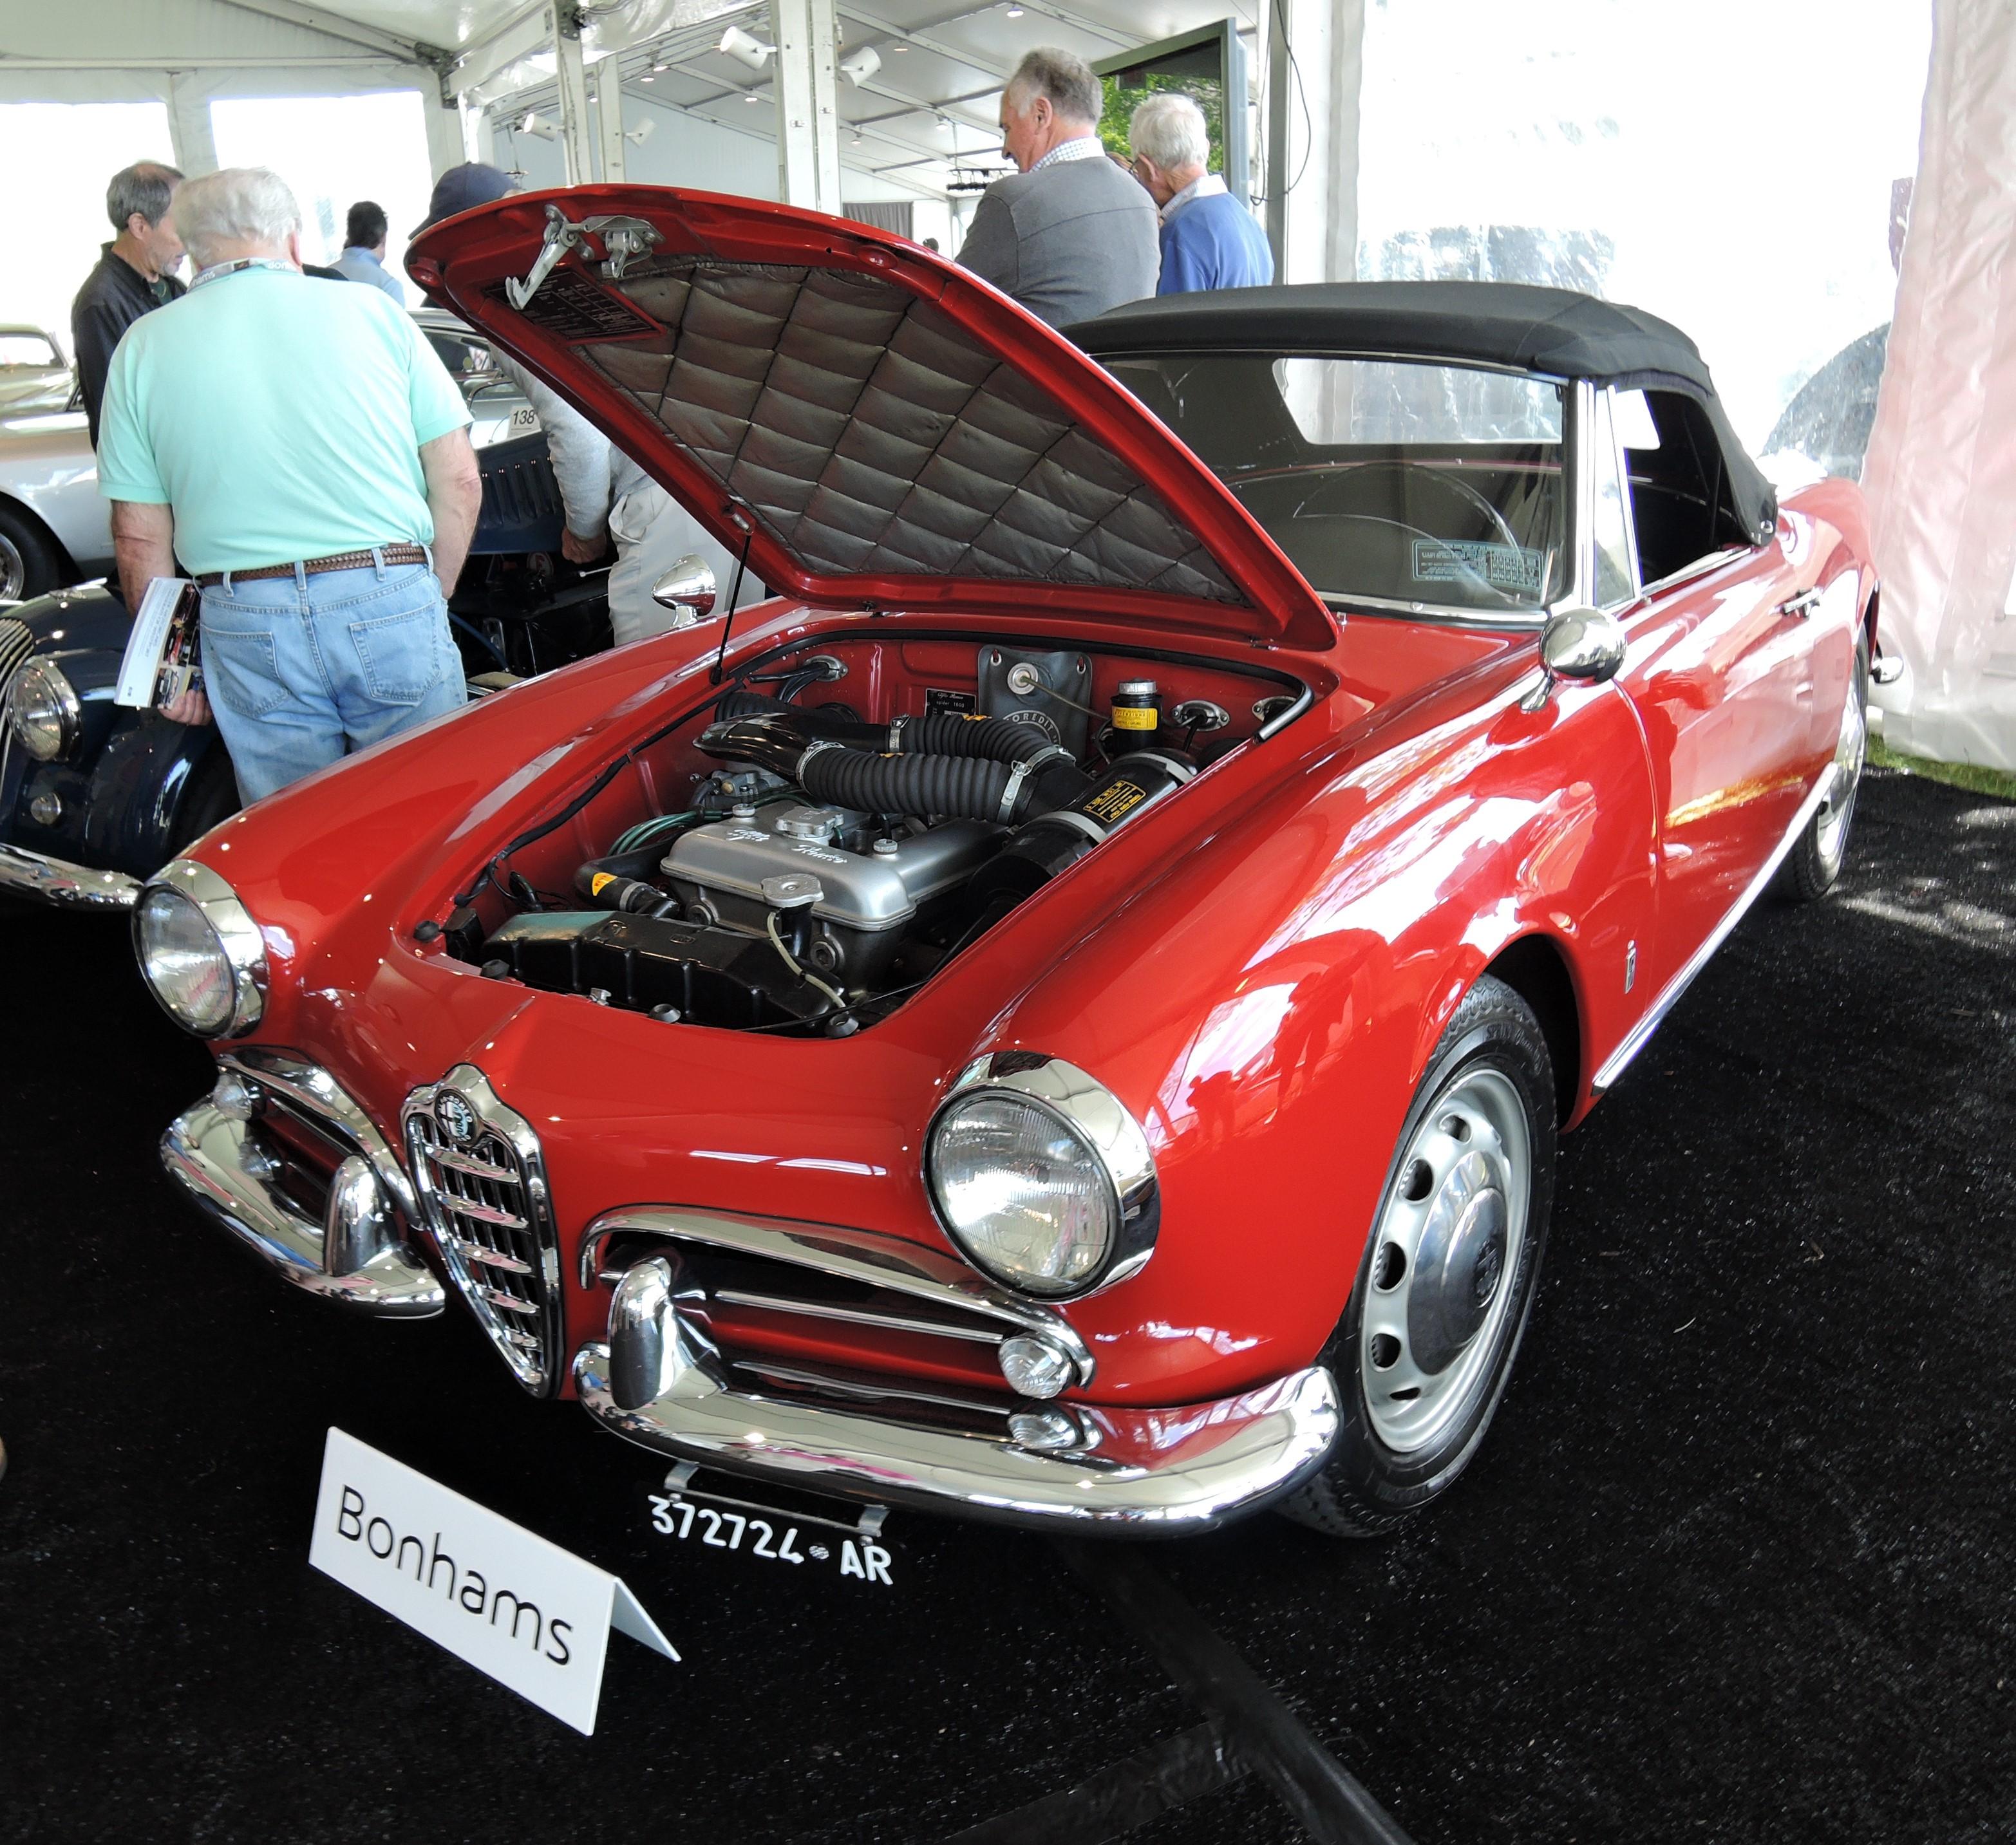 bonhams red 1963 Alfa Romeo Giulia 1600 Spider Normale - Greenwich Concours d'Elegance 2017